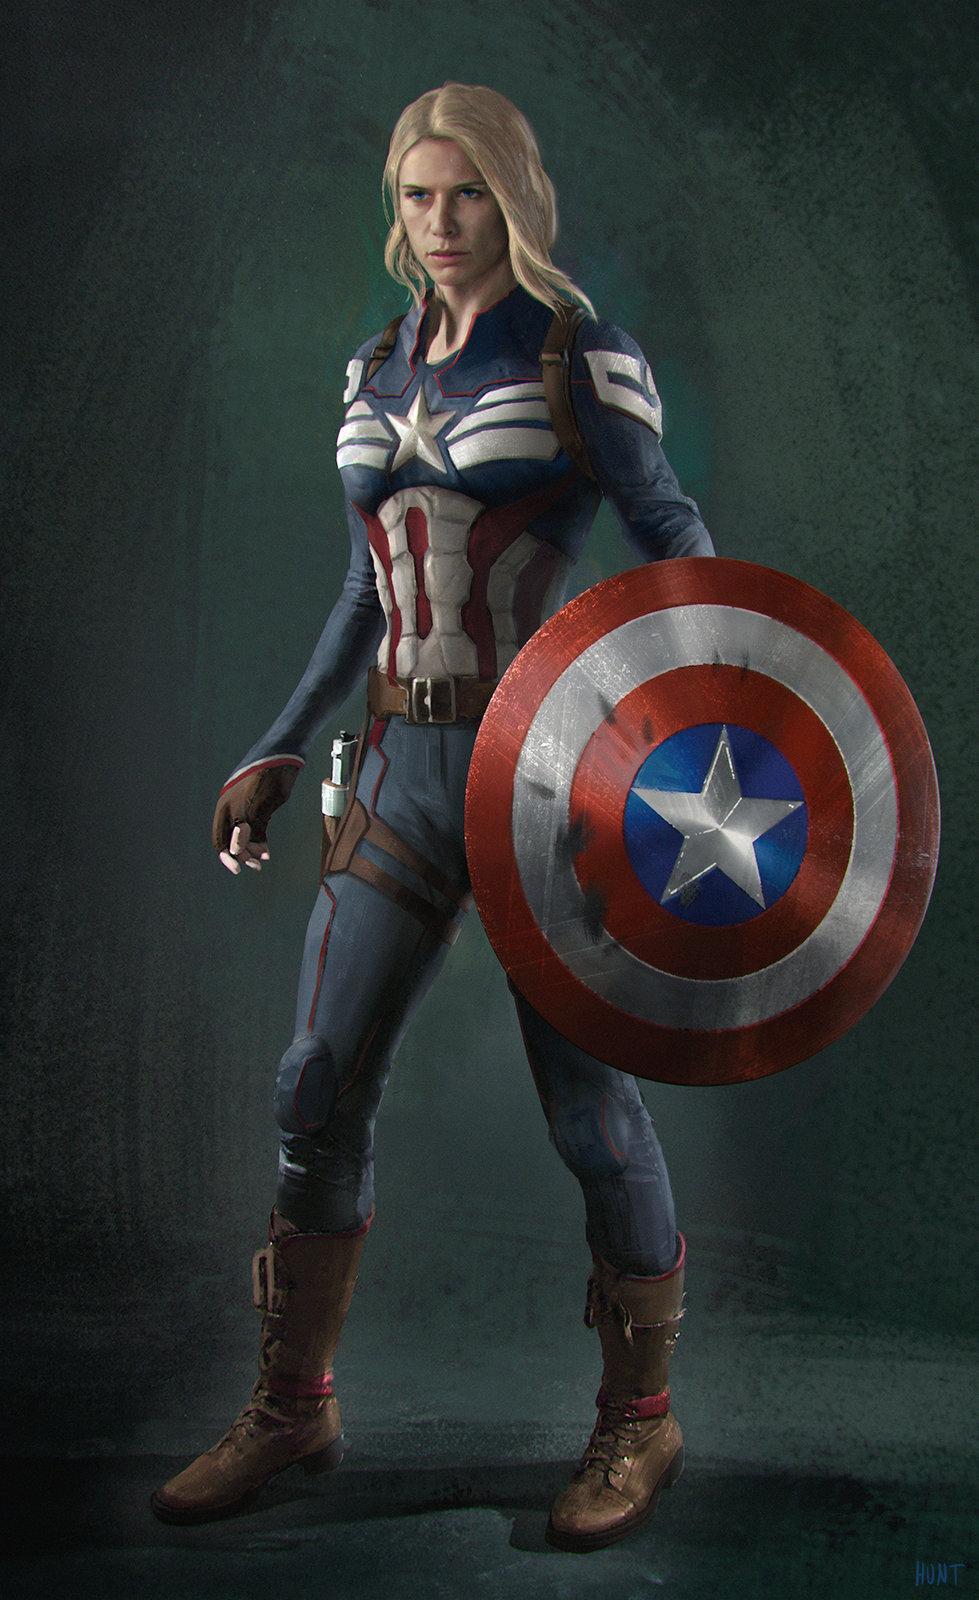 Captain America character design sheet